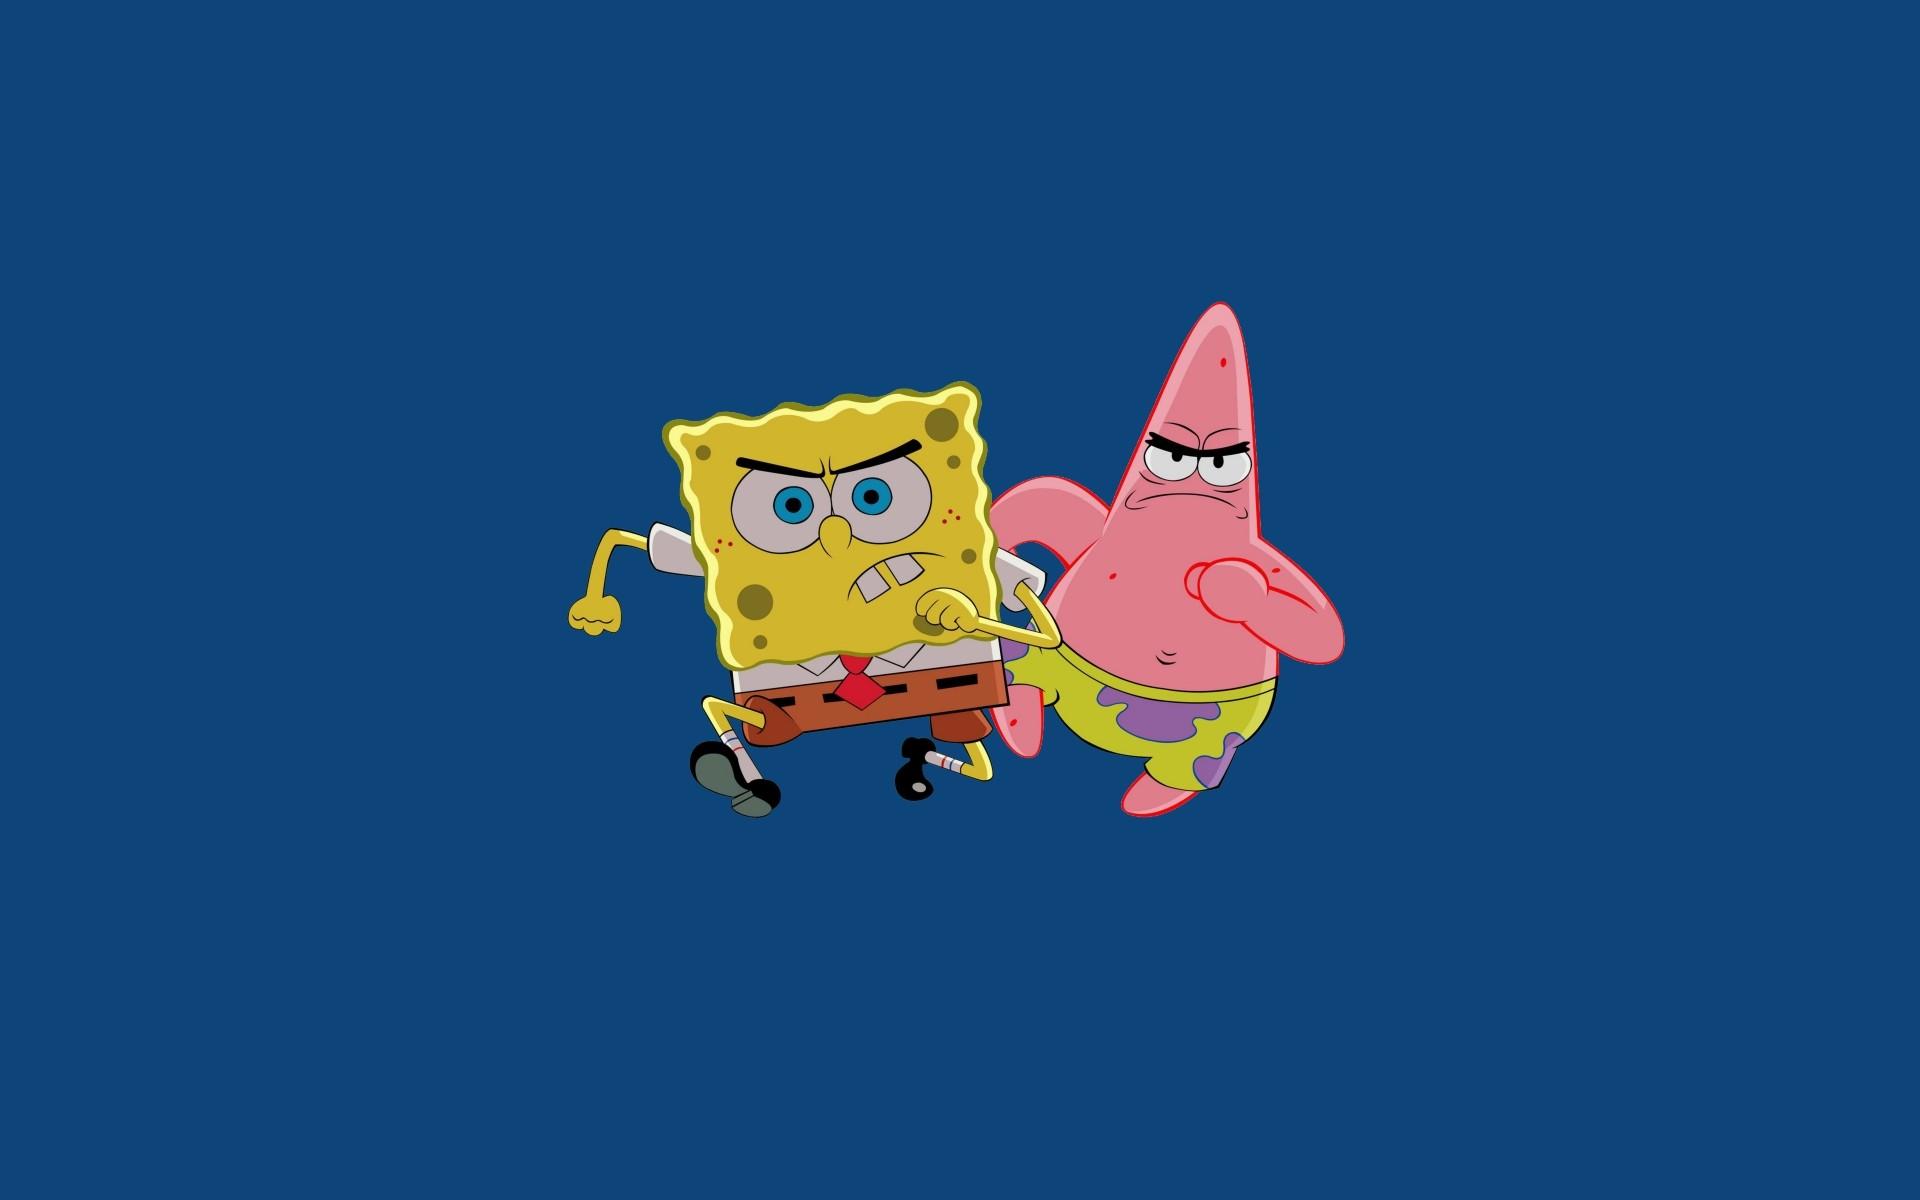 Blood Type Spongebob Emoji Face Www Picsbud Com